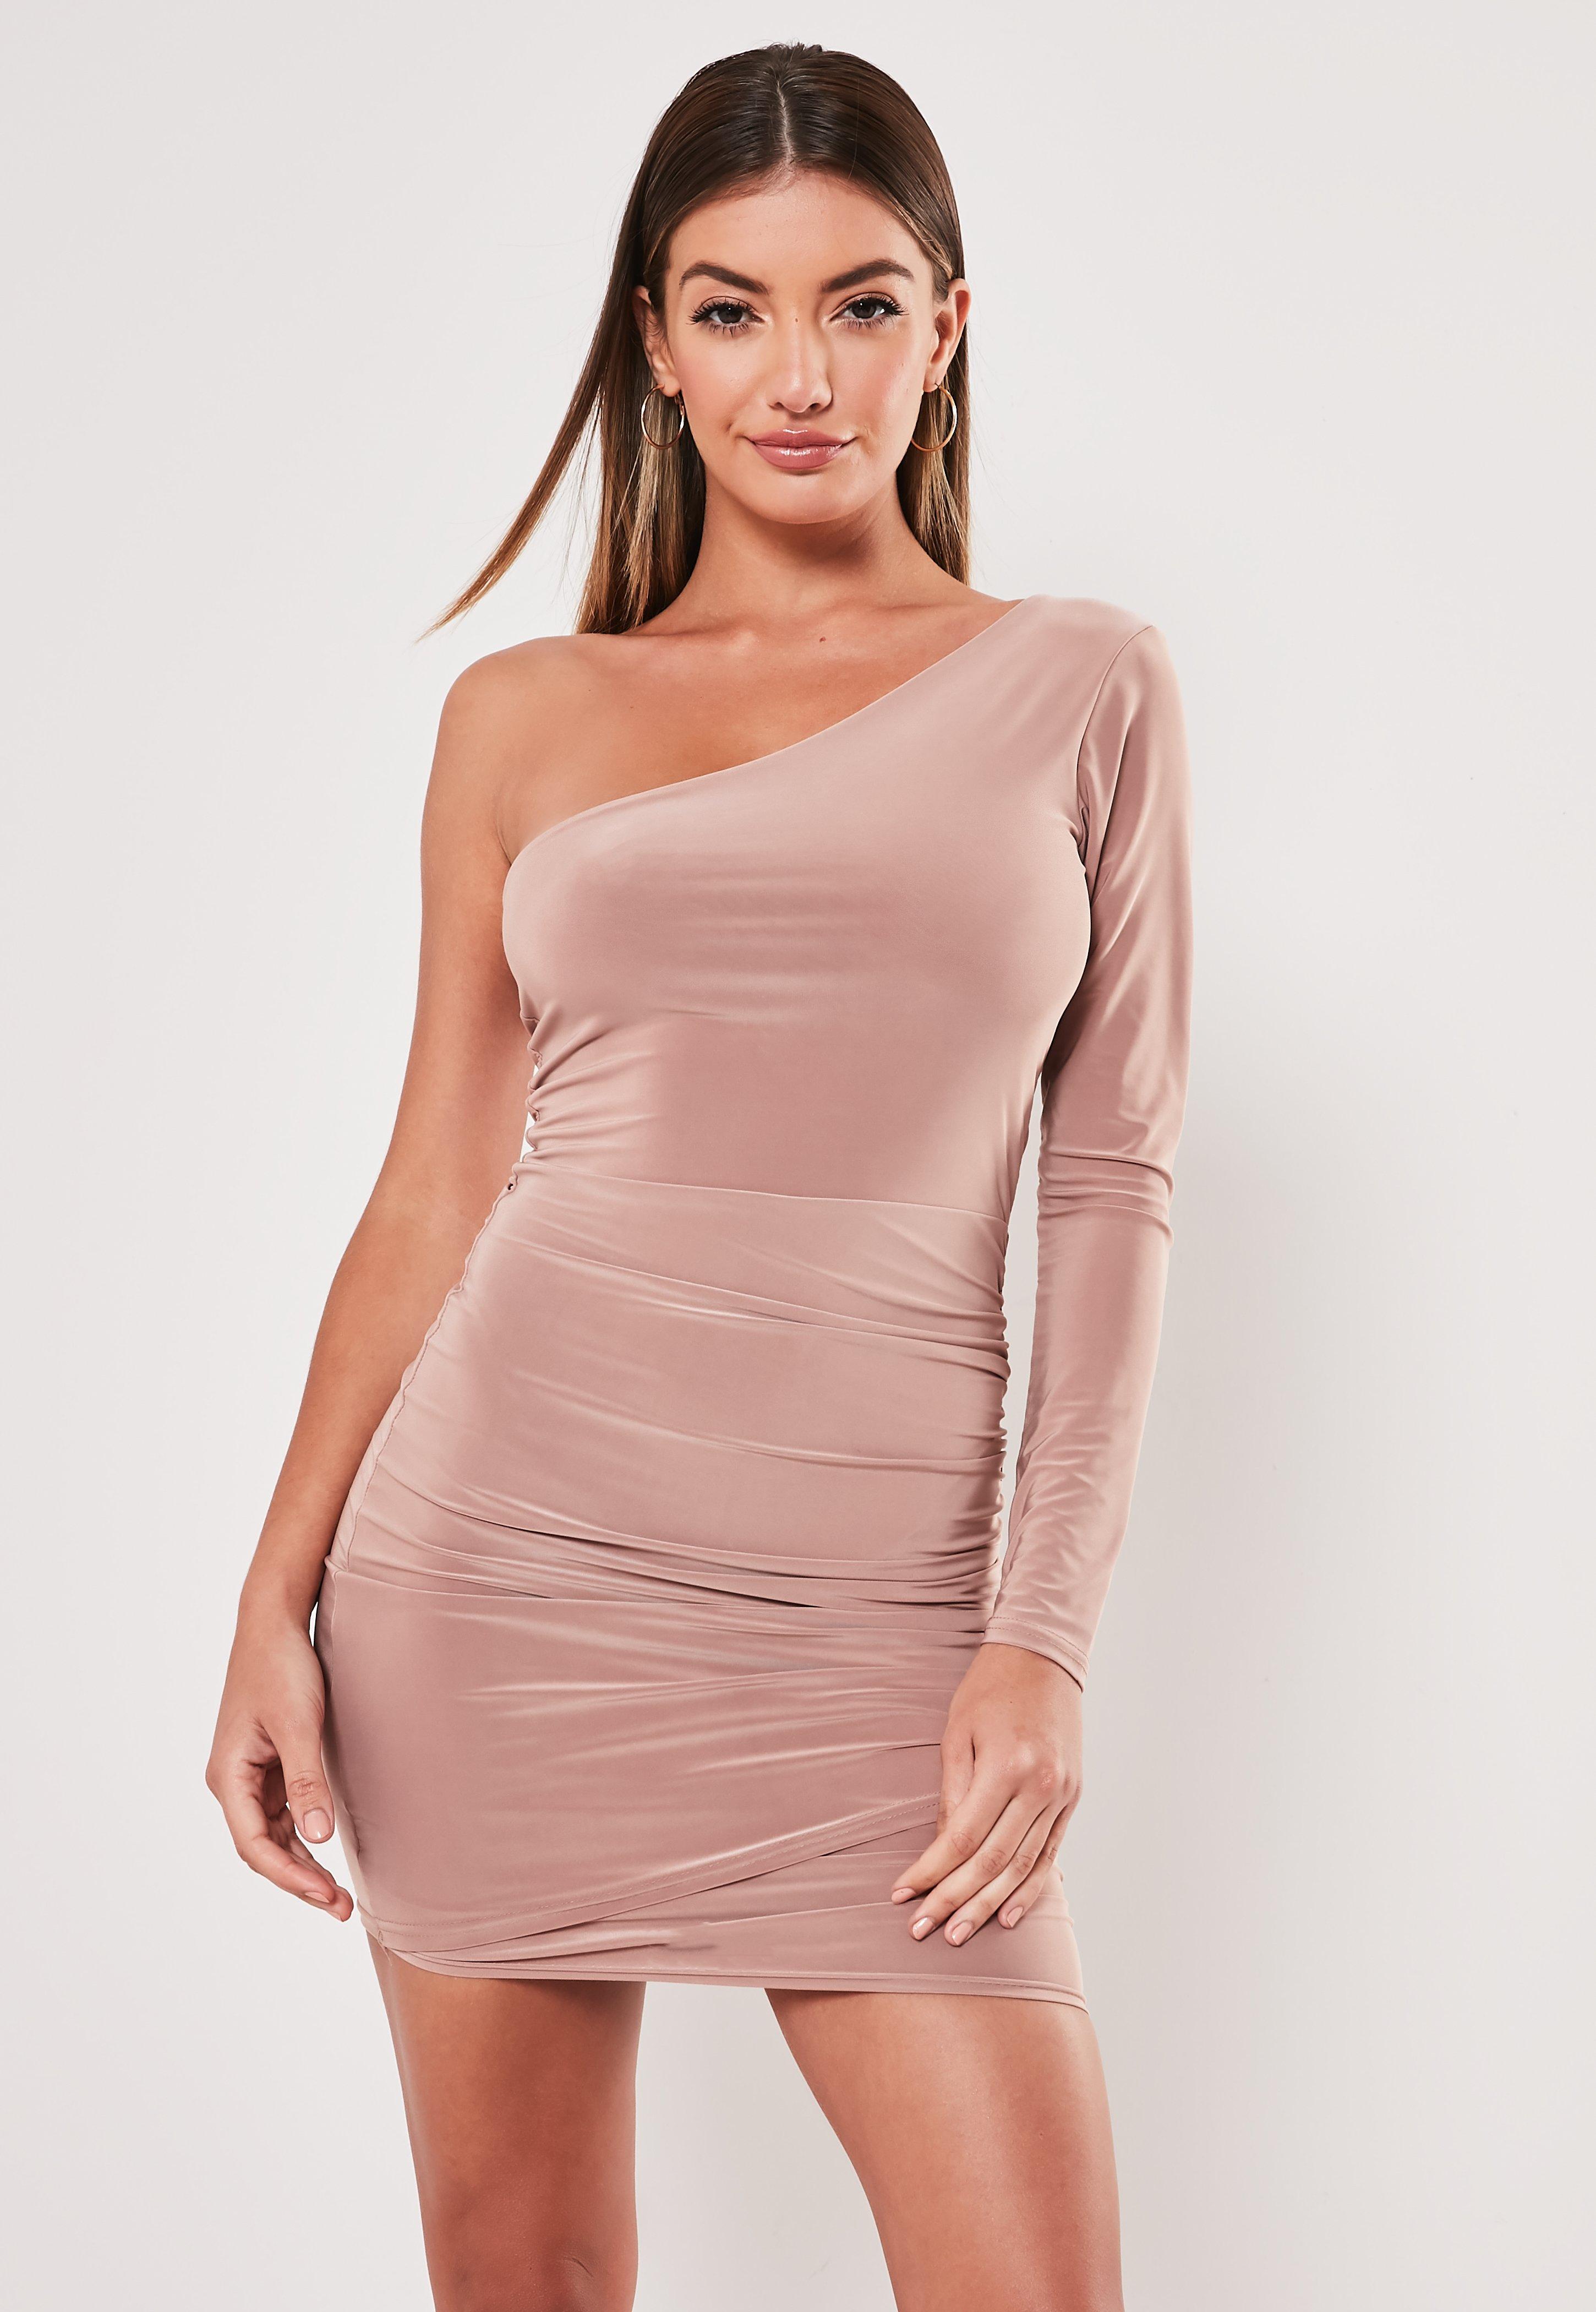 e73827e5ddcb9 Nude Dresses | Beige & Camel Dresses - Missguided